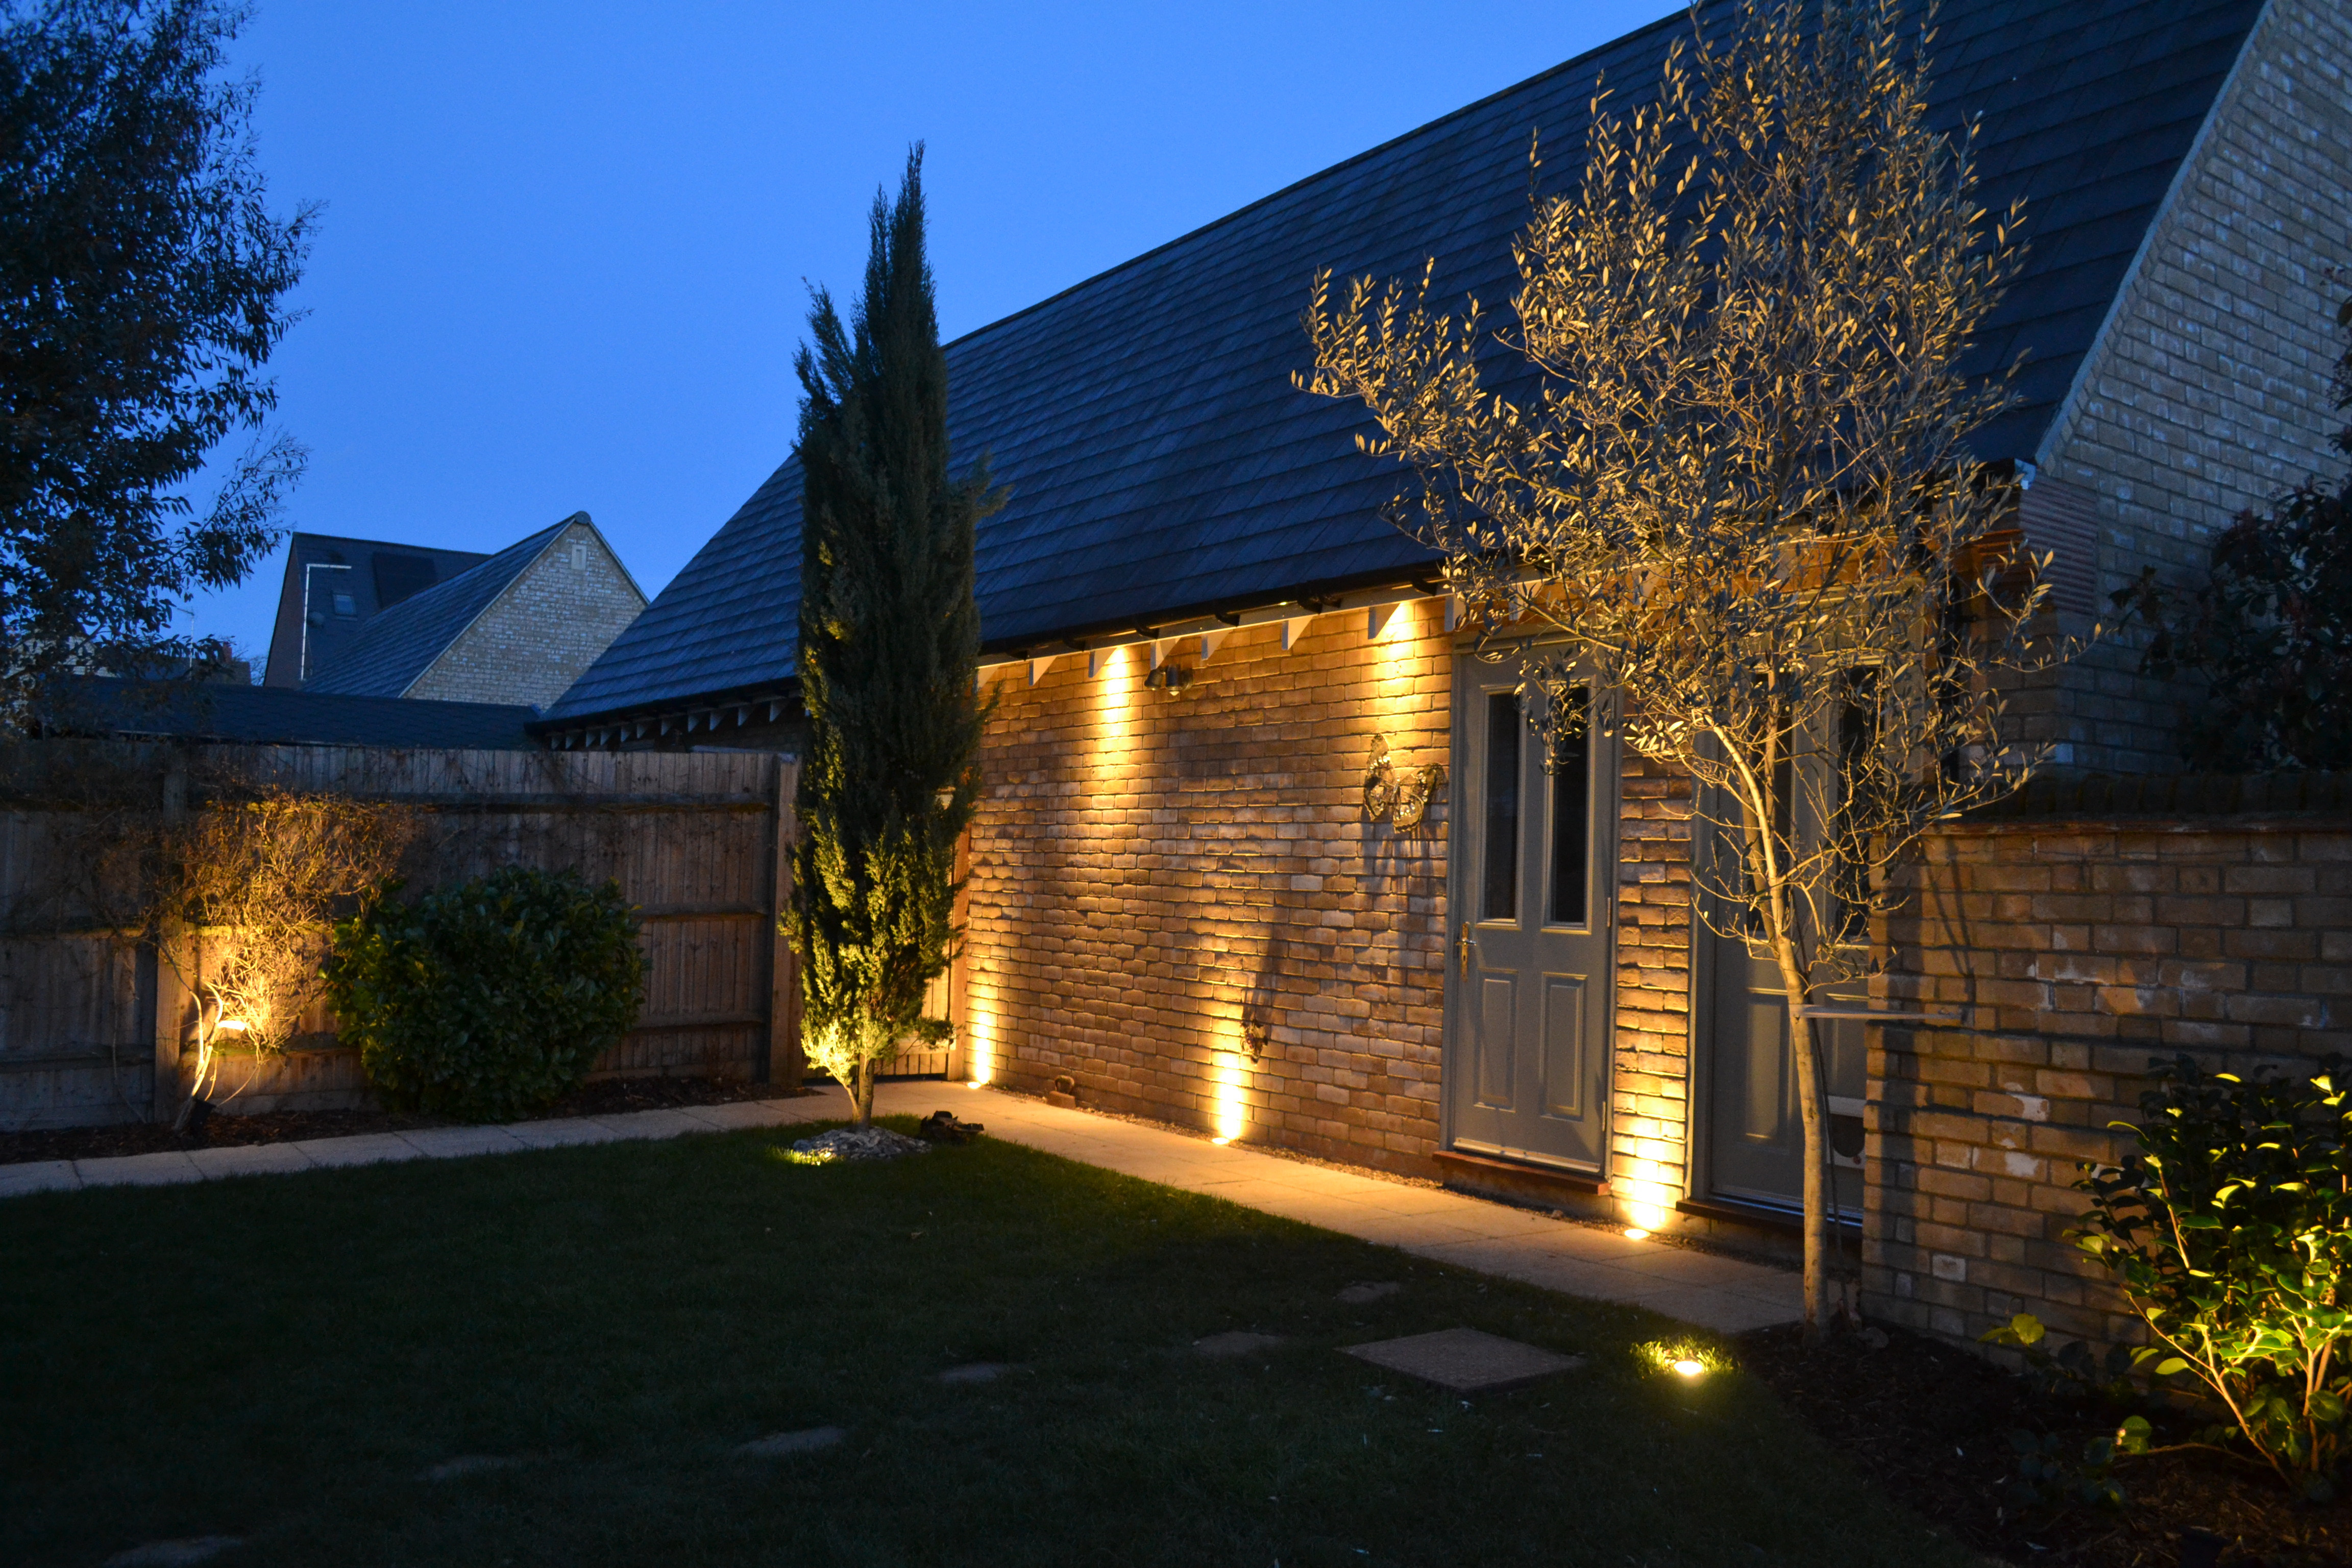 illuminating Gardens Garden Lighting Image Gallery